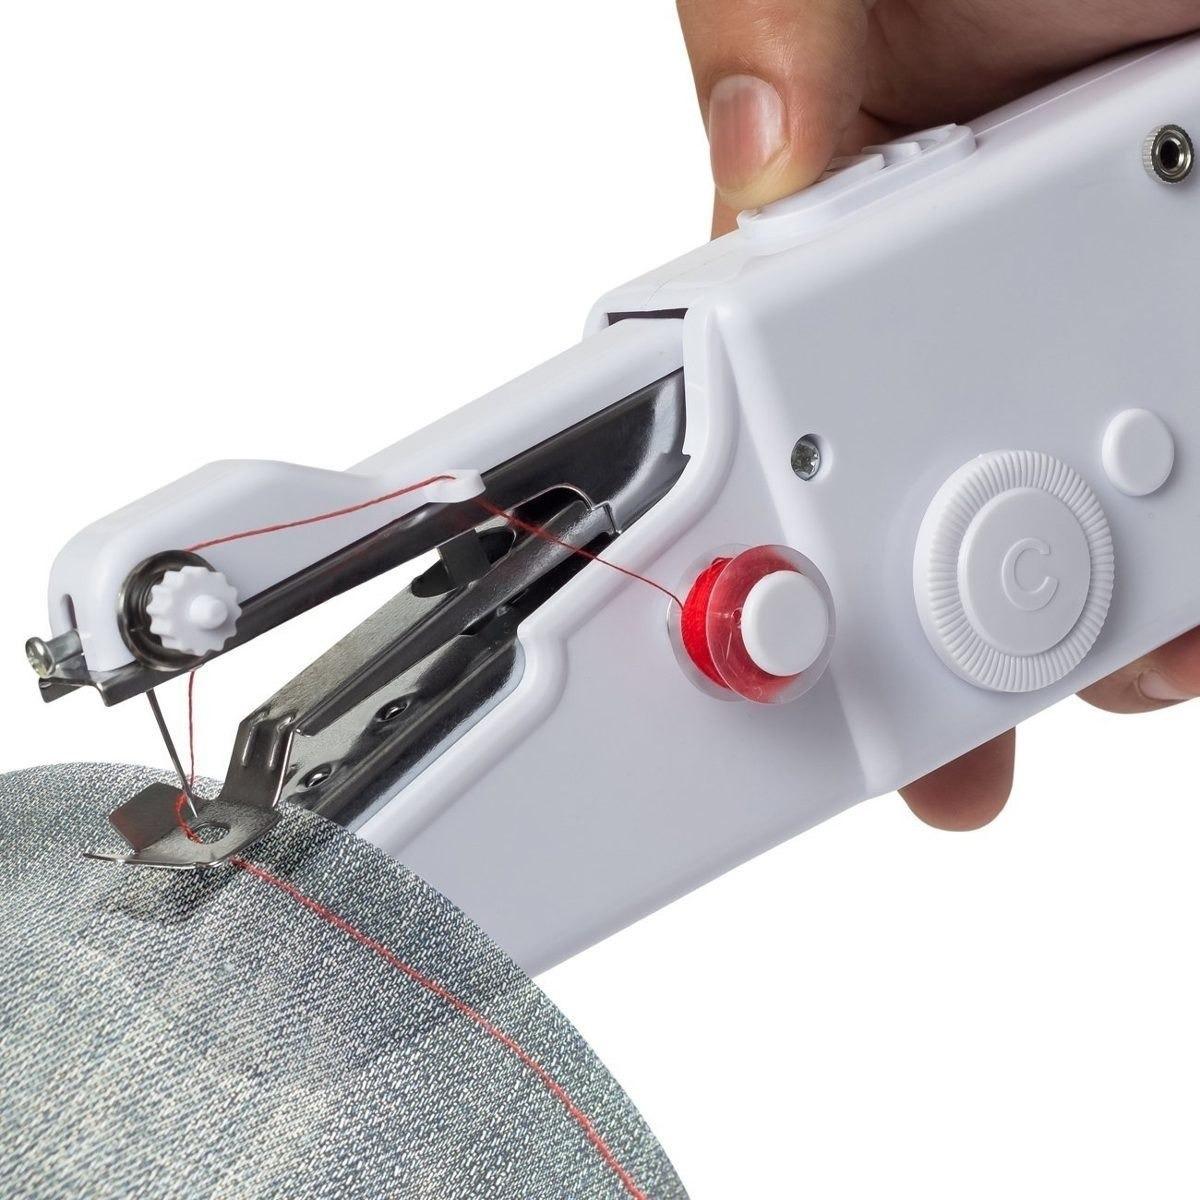 Maquina De Coser Portatil Handy Stitch ¡ Cose Todo